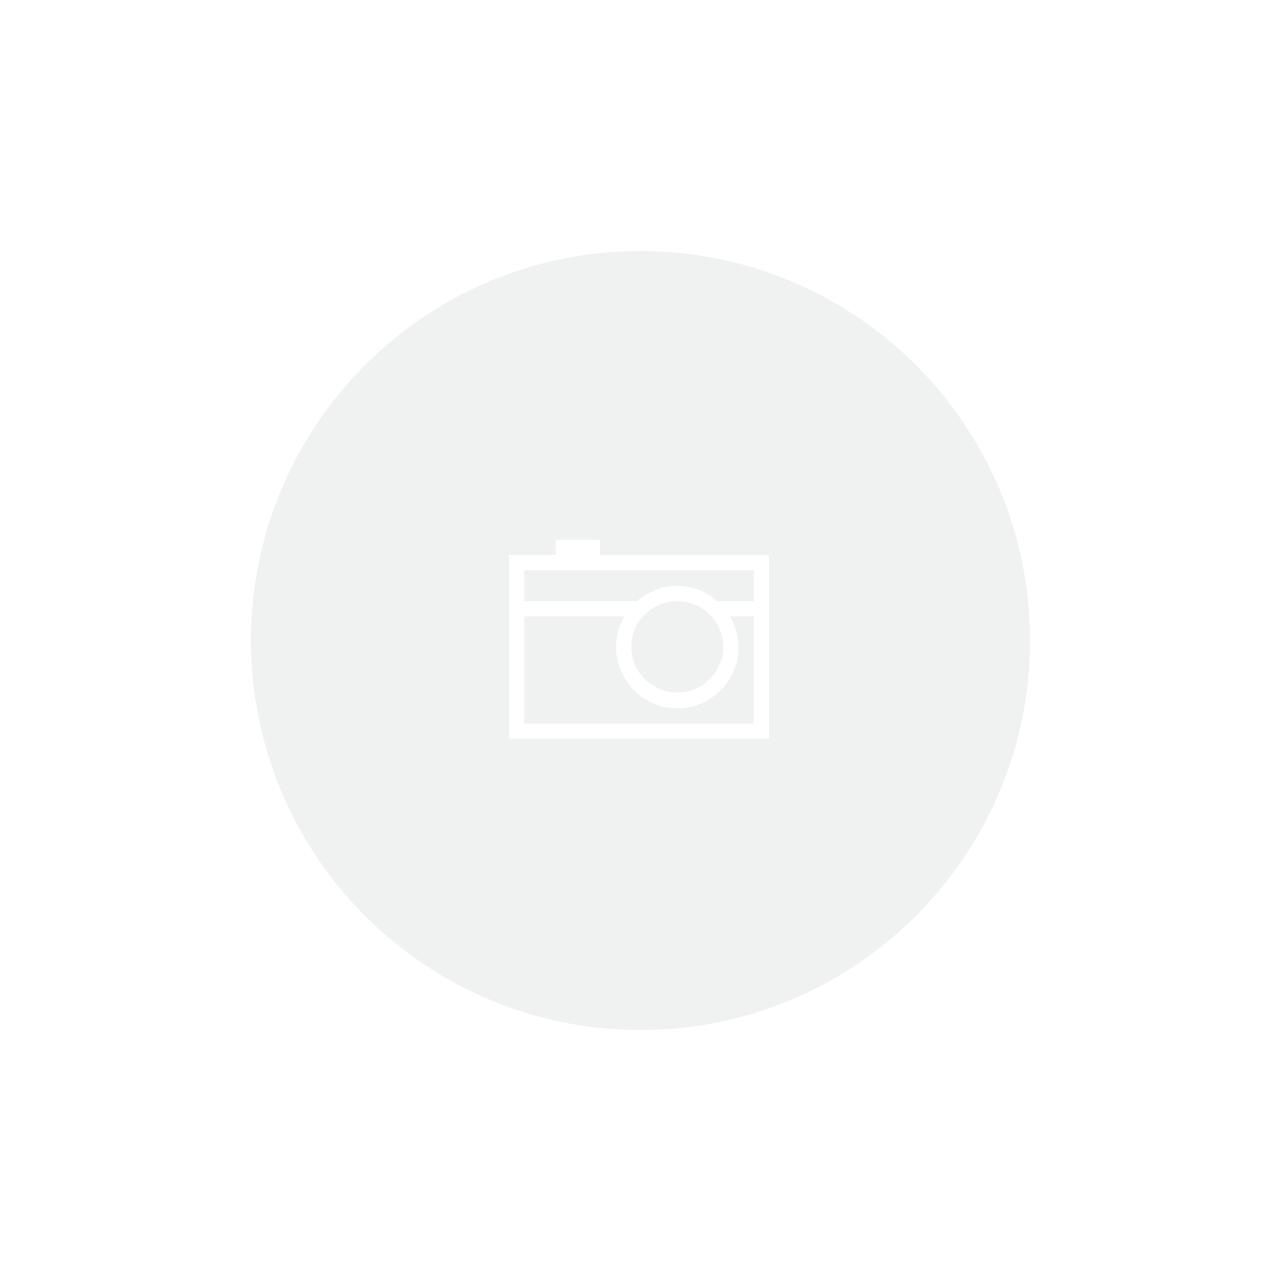 Conjunto 6 Sousplat de Plastico Branco Patinado 33cm